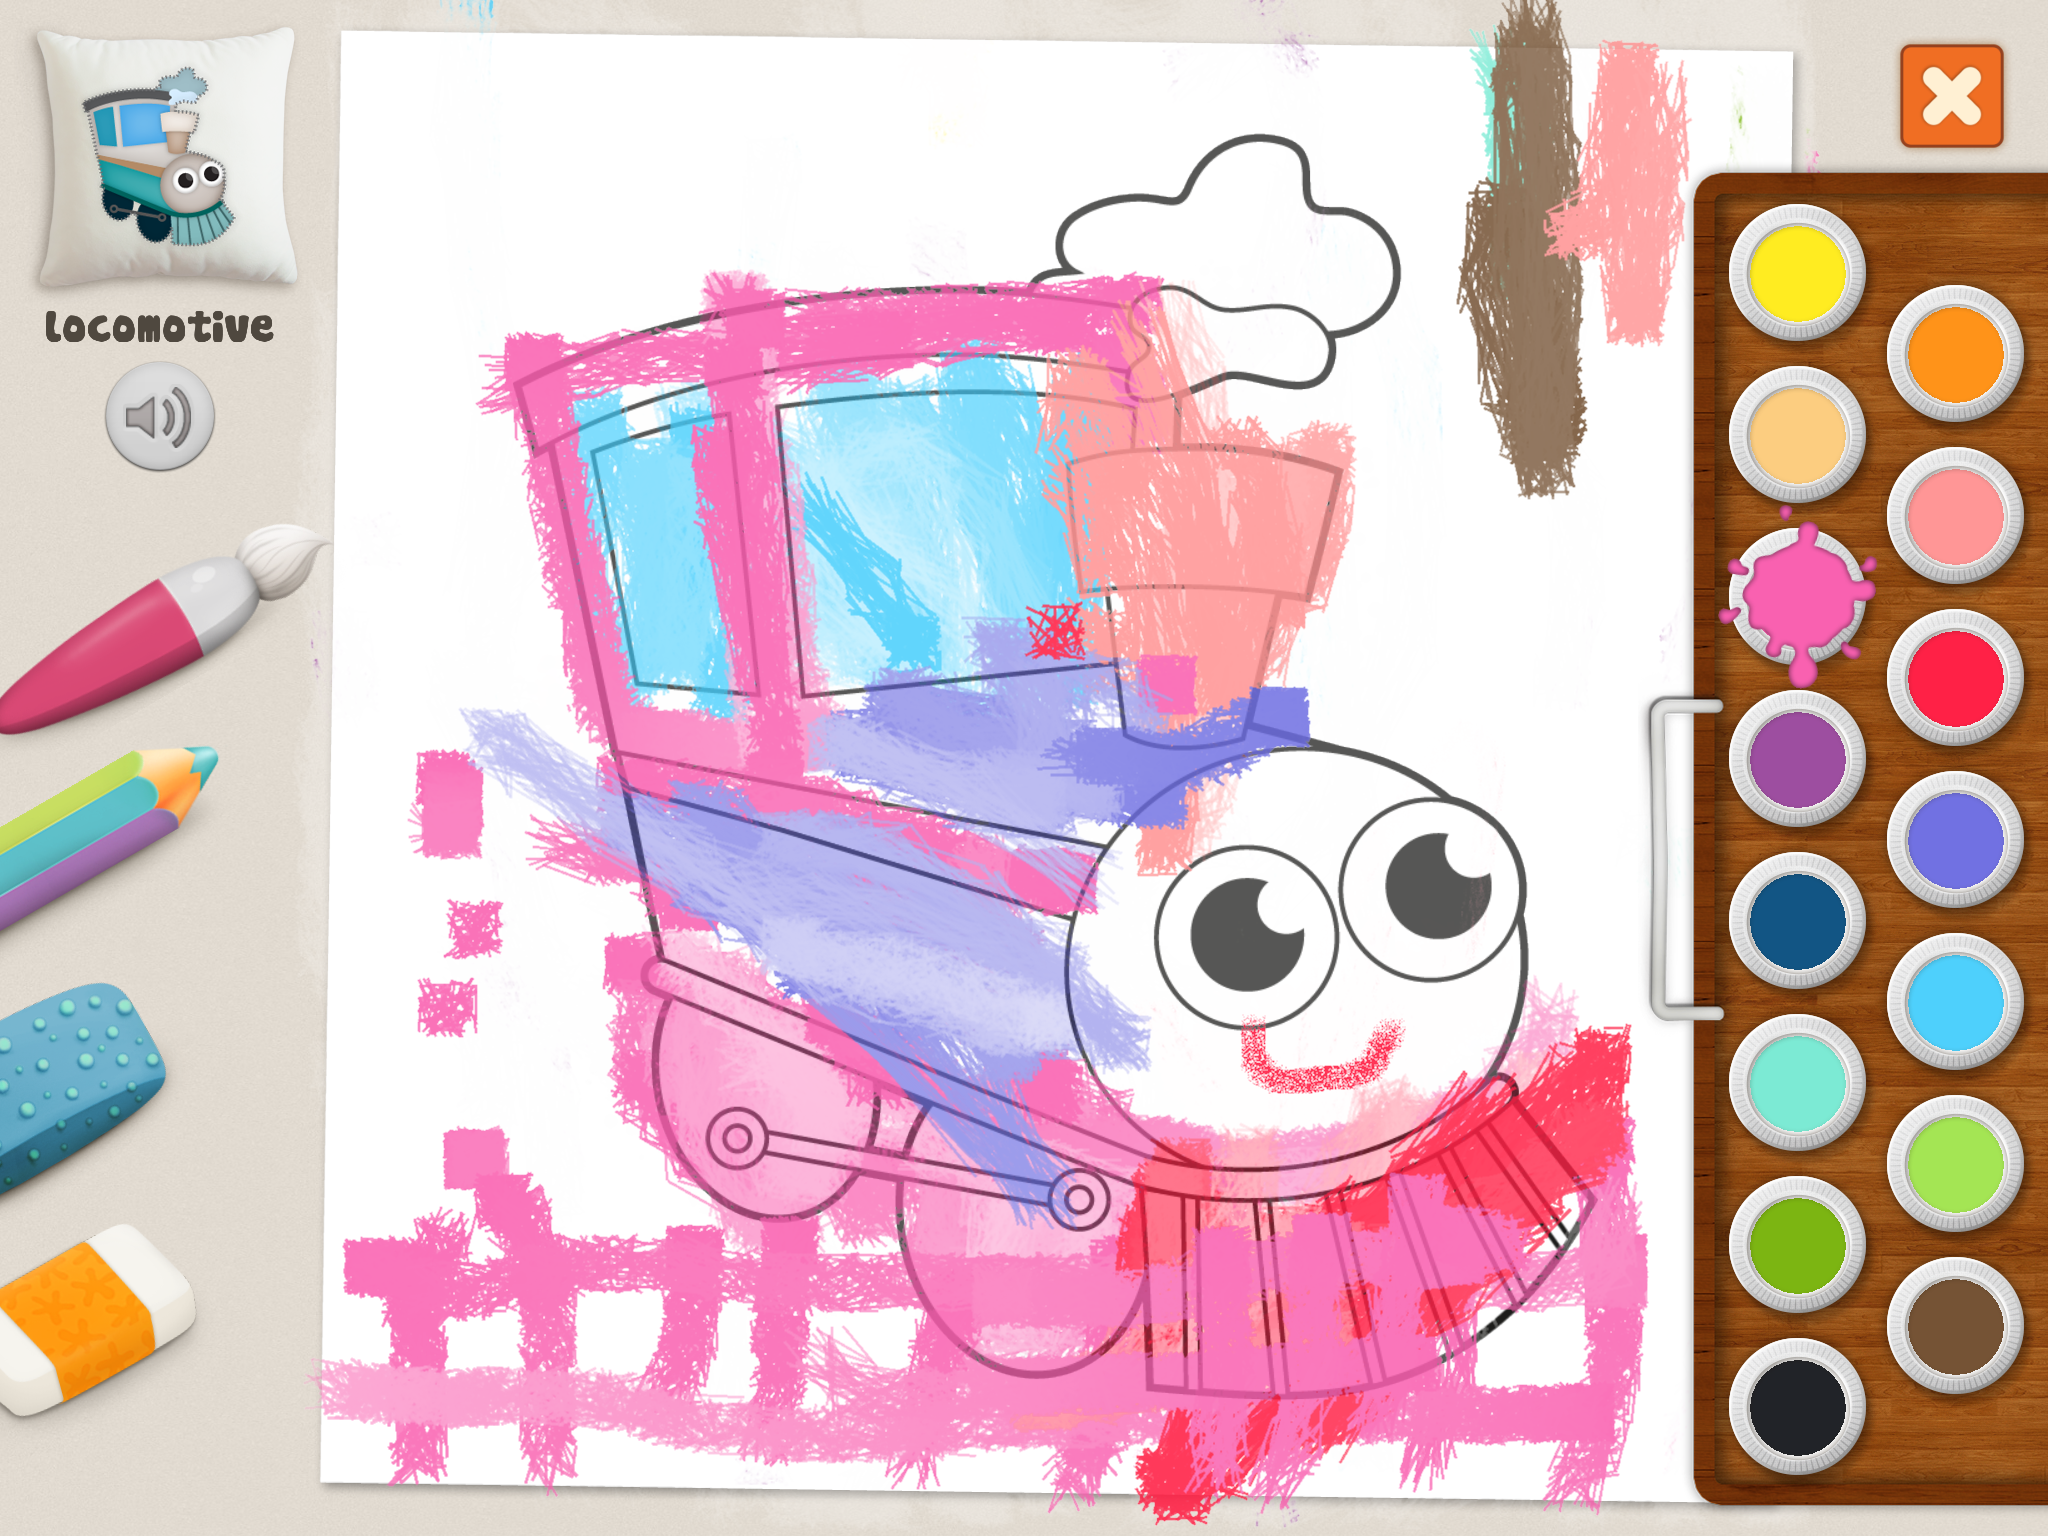 Locomotive Coloring Pages Memollow App For Kids Pin Art Coloring Pages Color